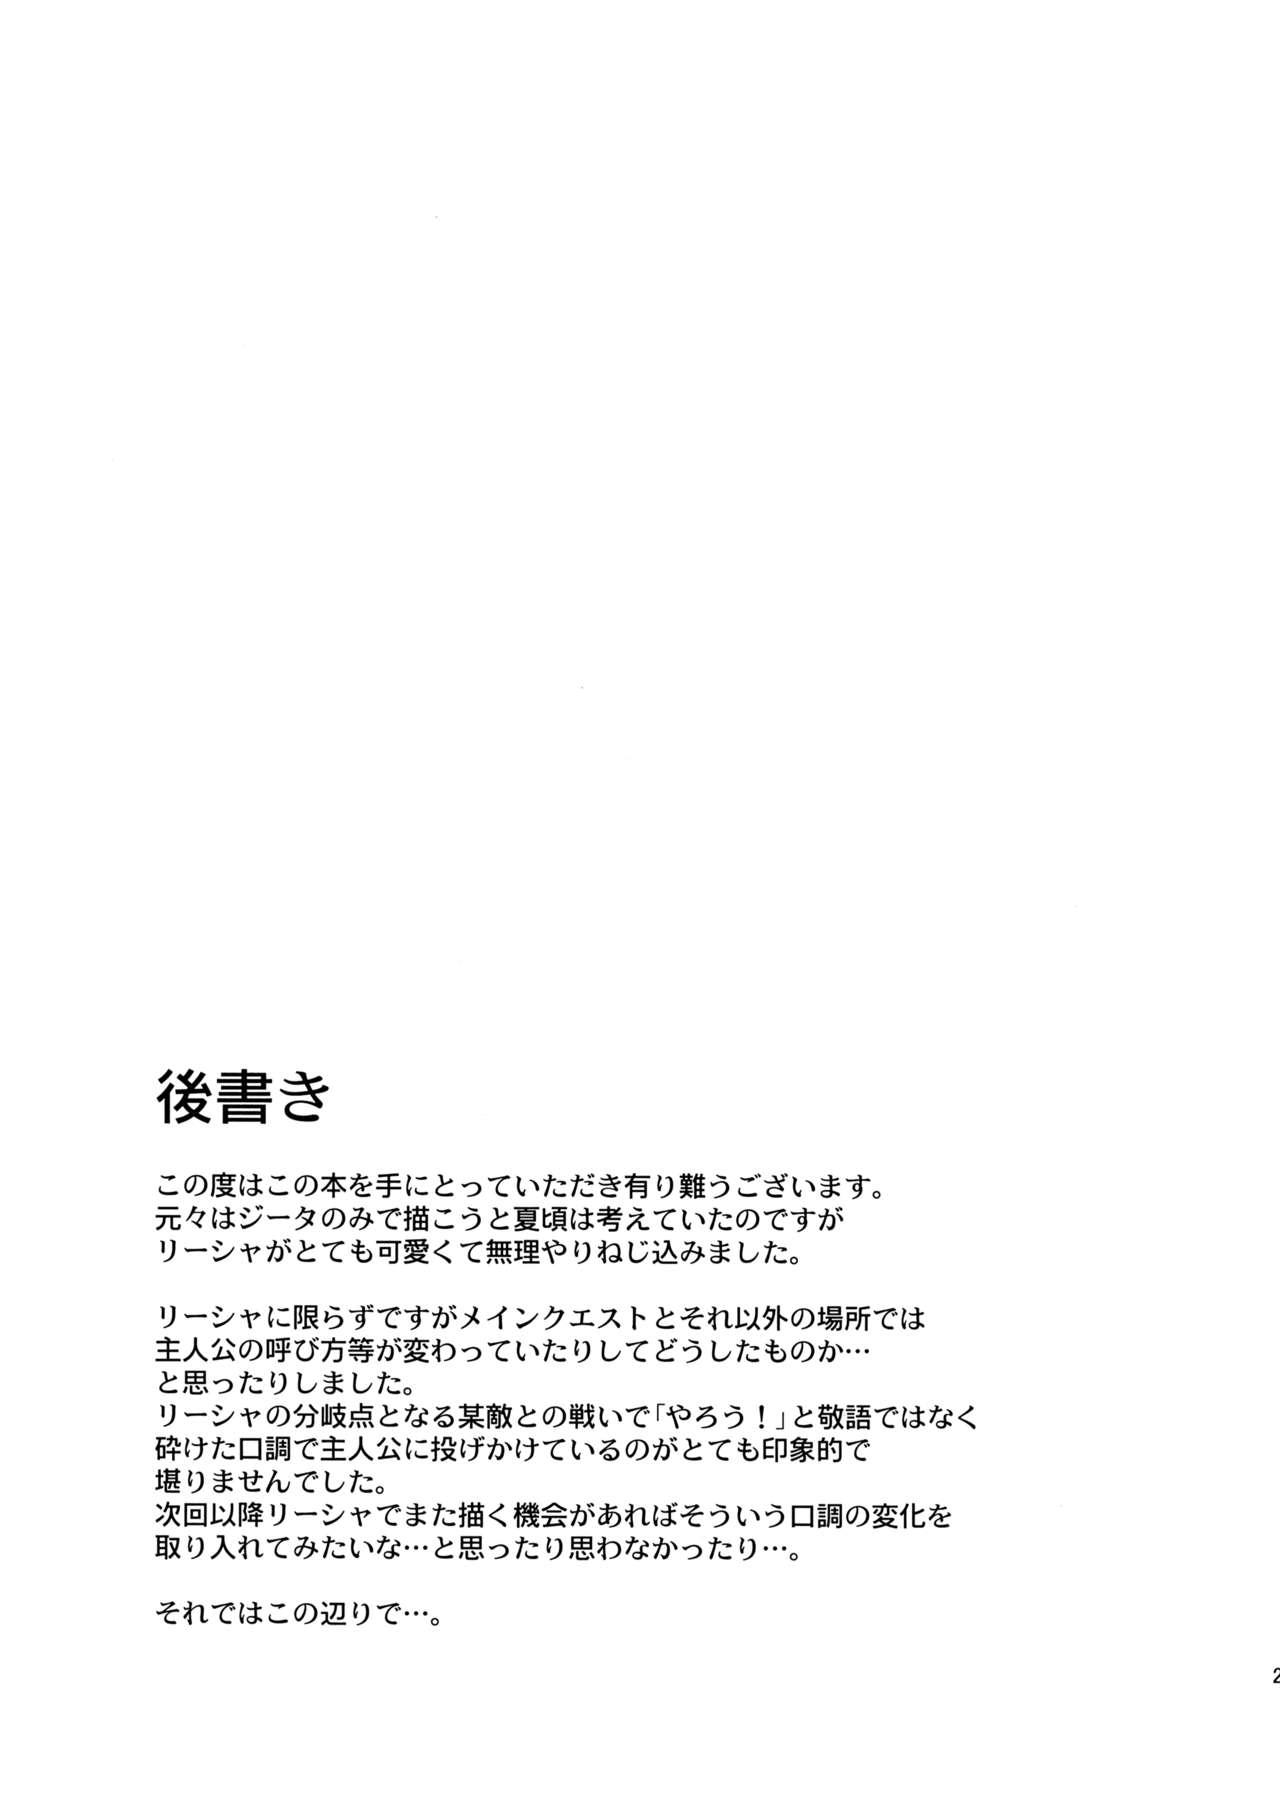 Kantan! Rupi no Kasegikata 23